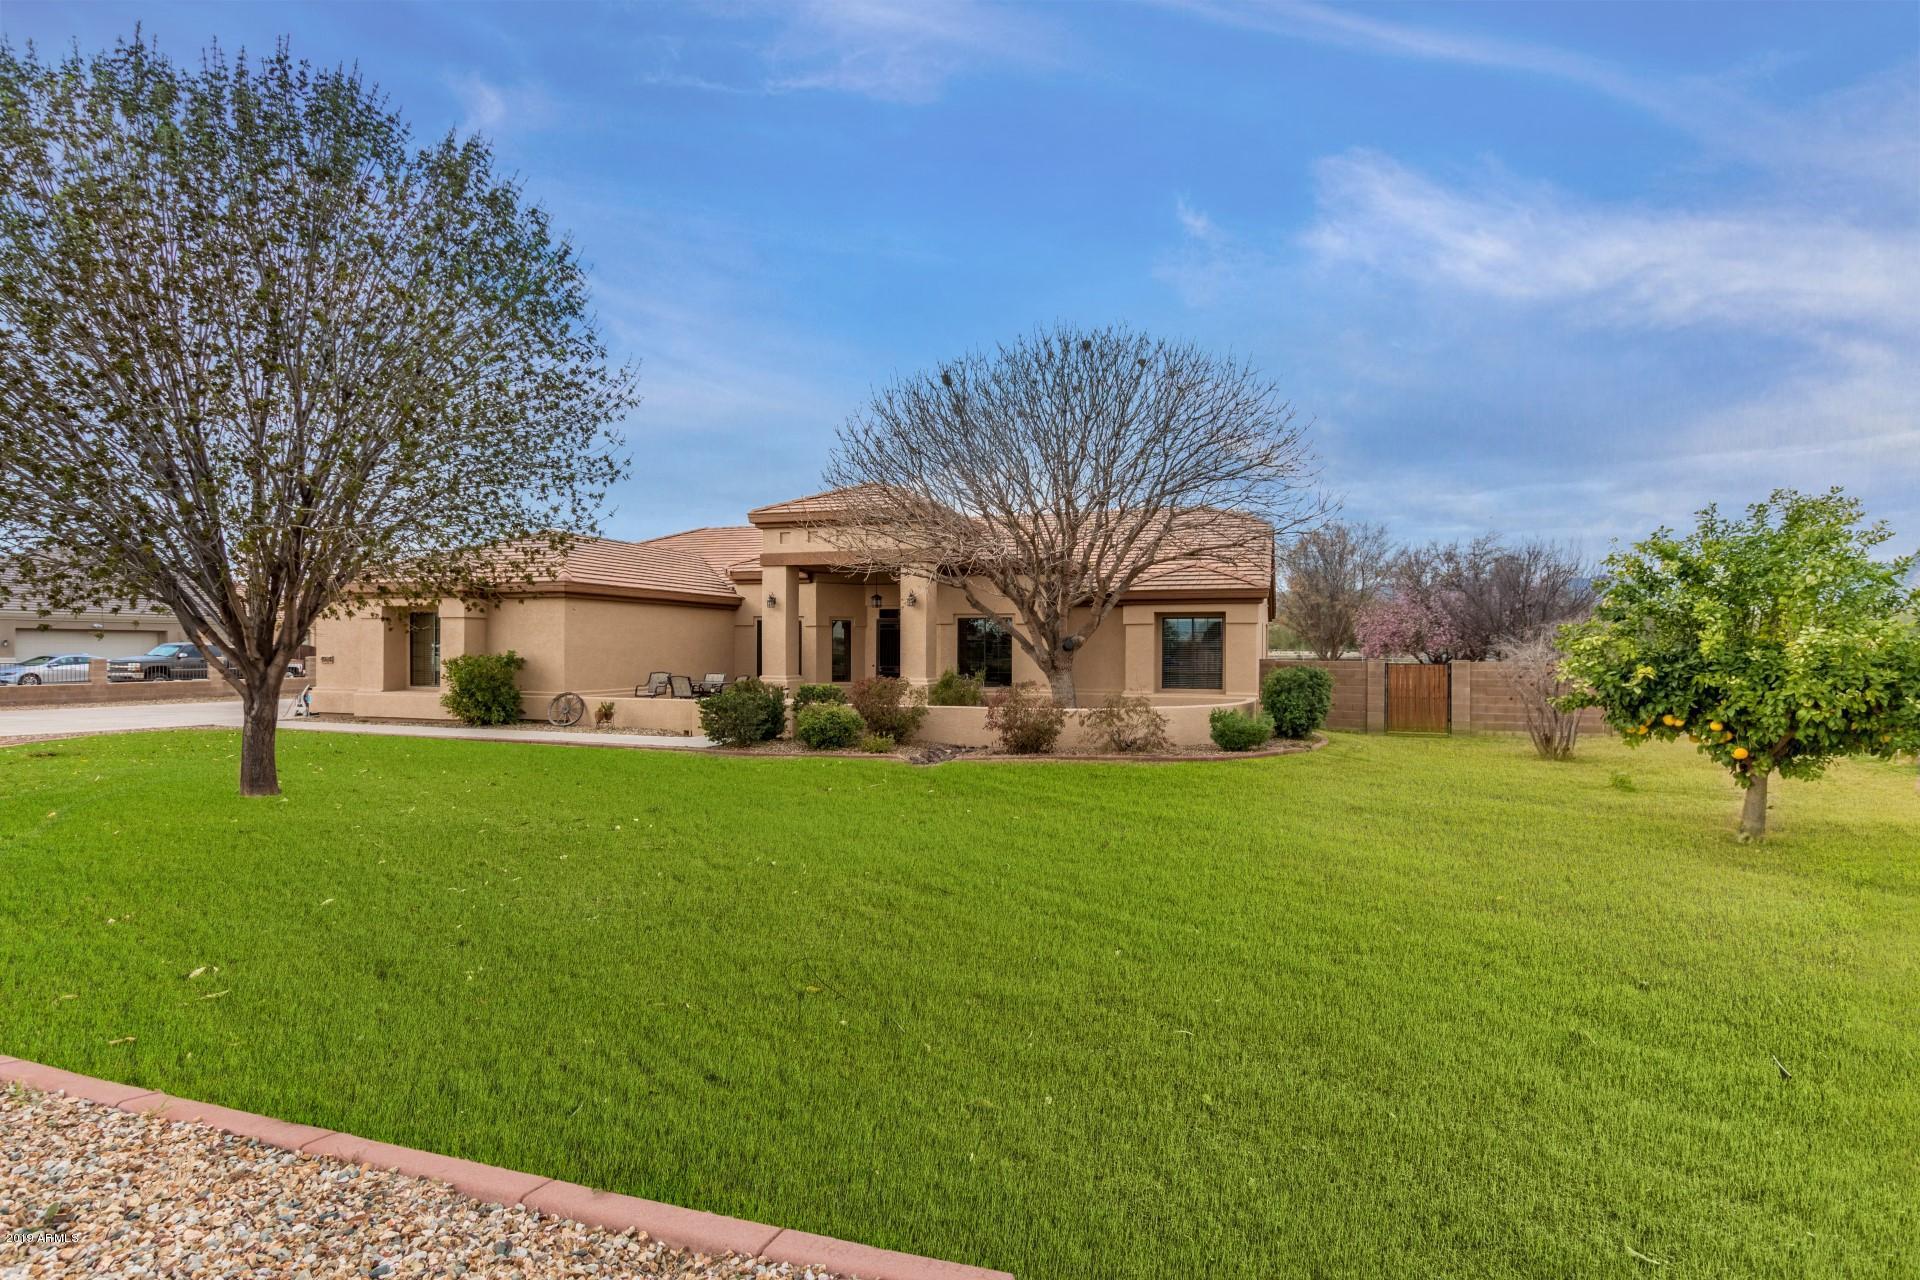 Photo of 4924 N 190TH Drive, Litchfield Park, AZ 85340